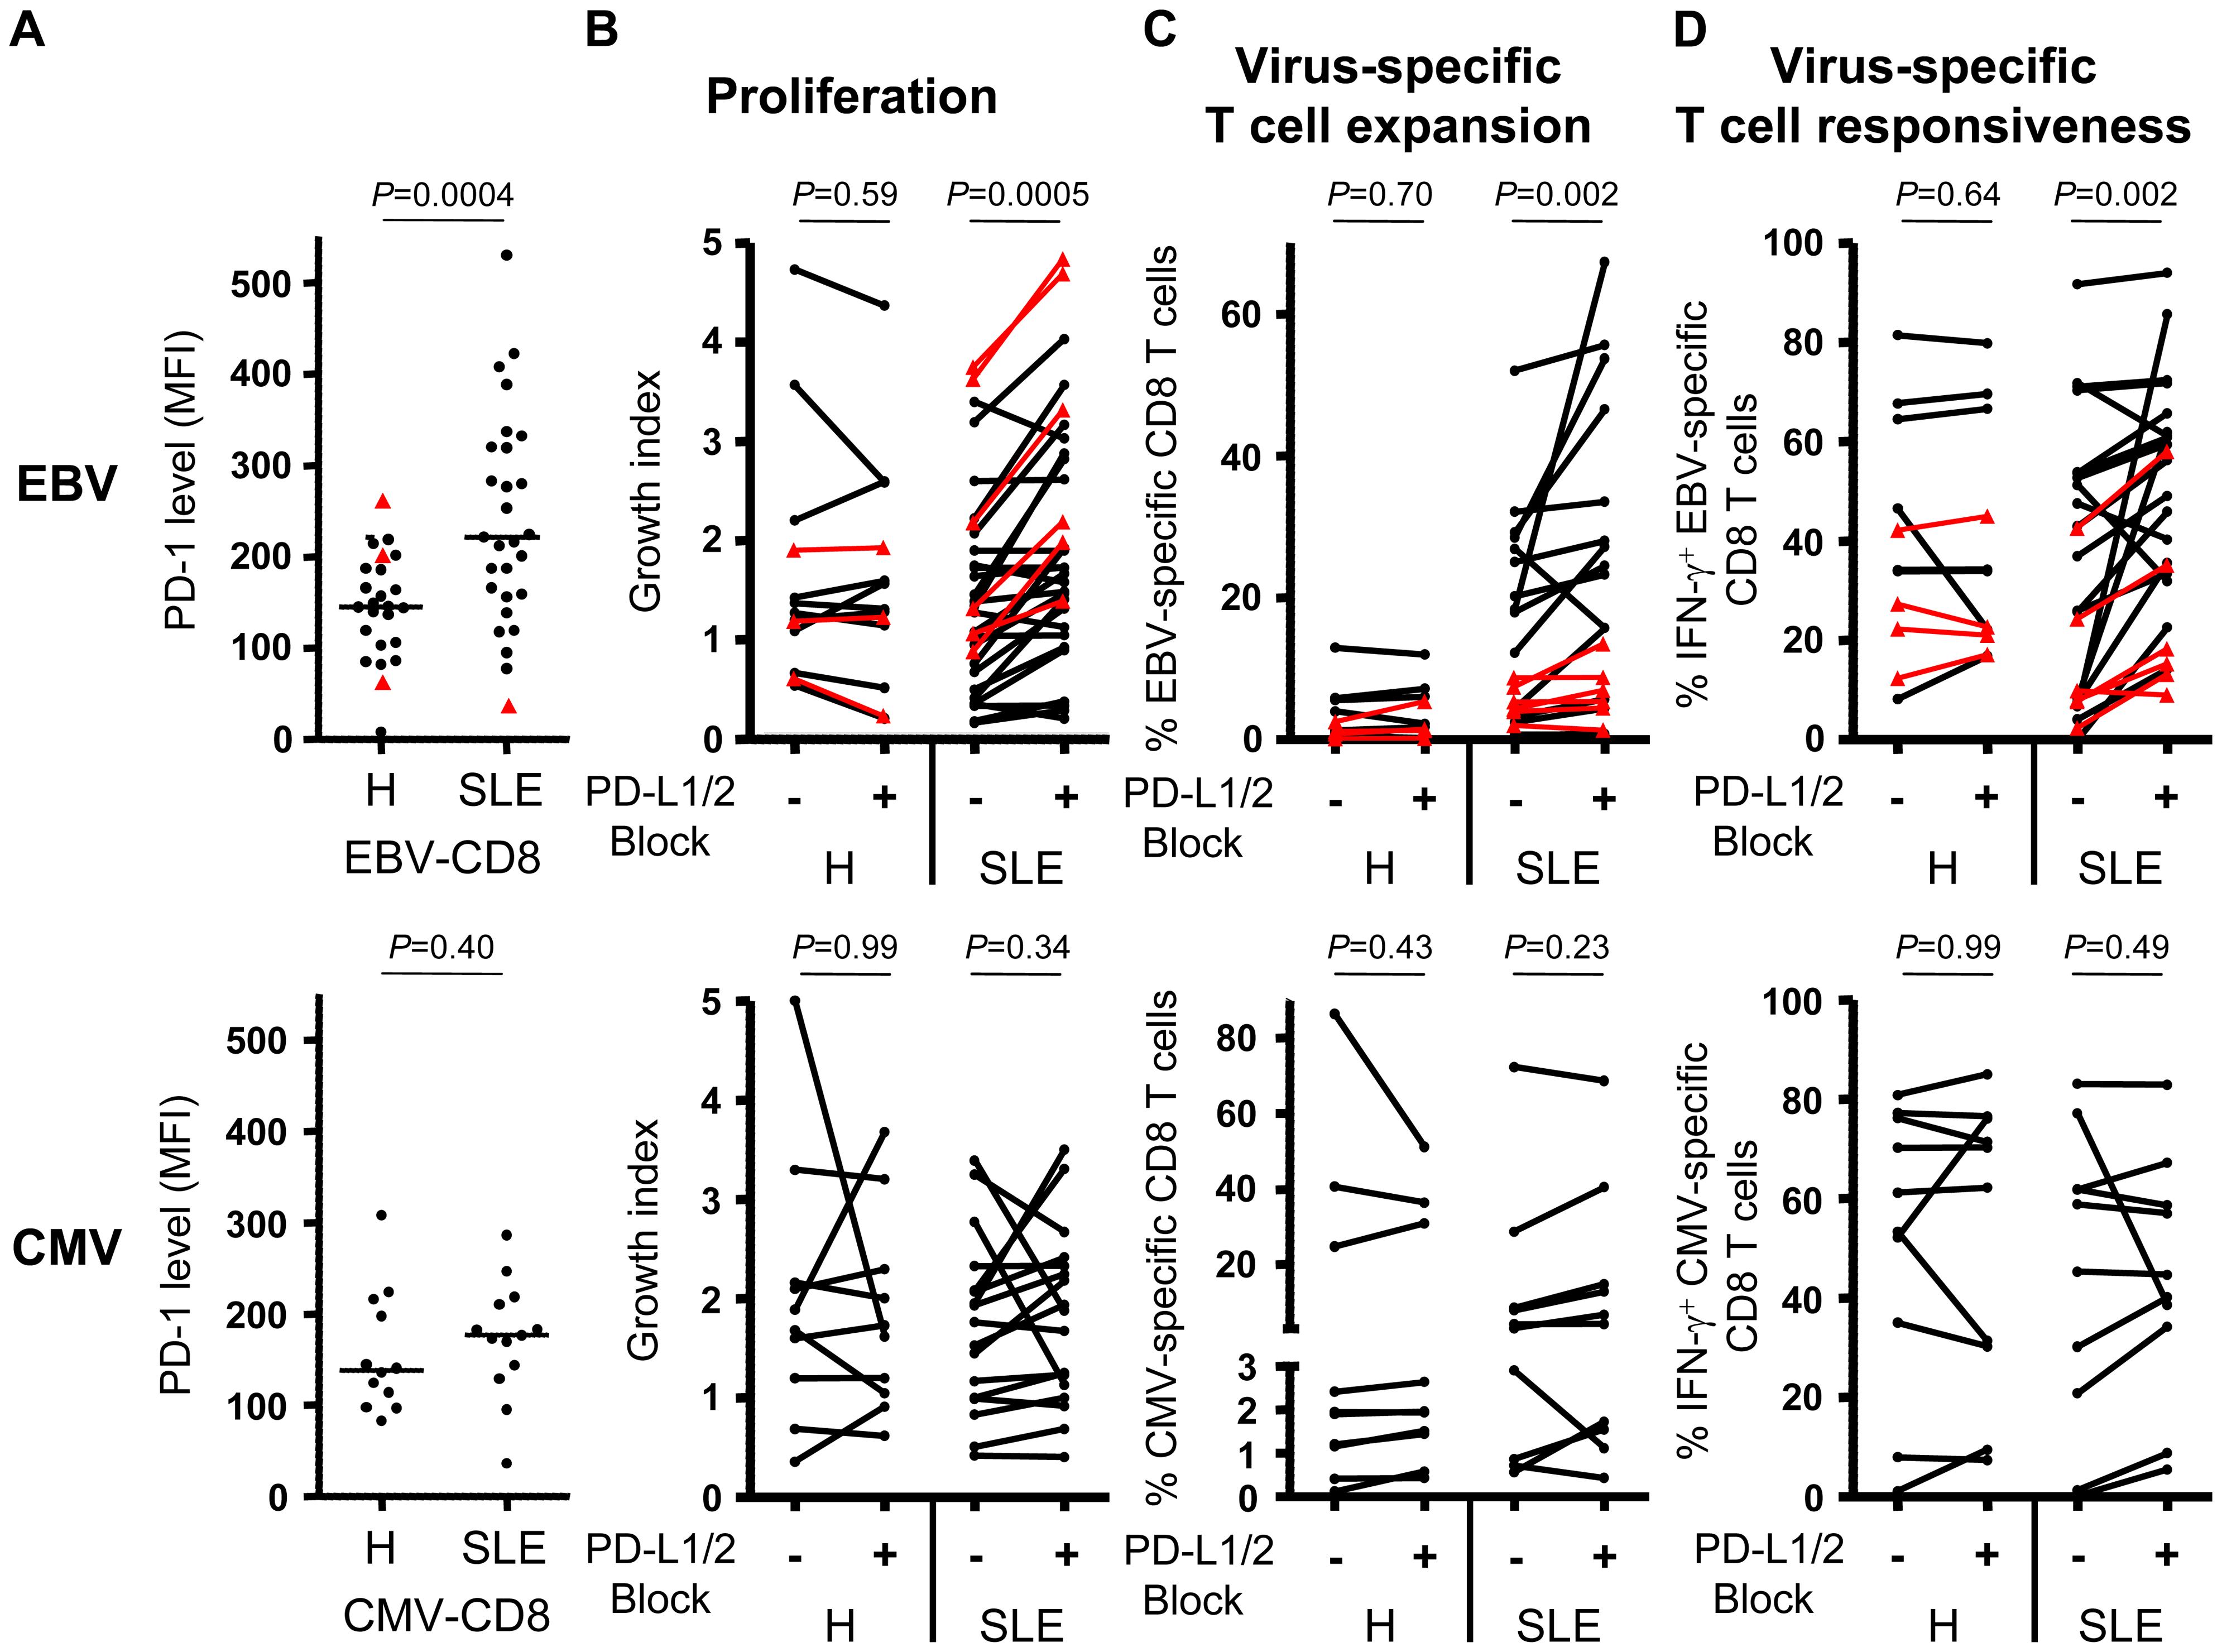 Blockade of PD-1 signalling revigorates EBV-specific T cell responses.